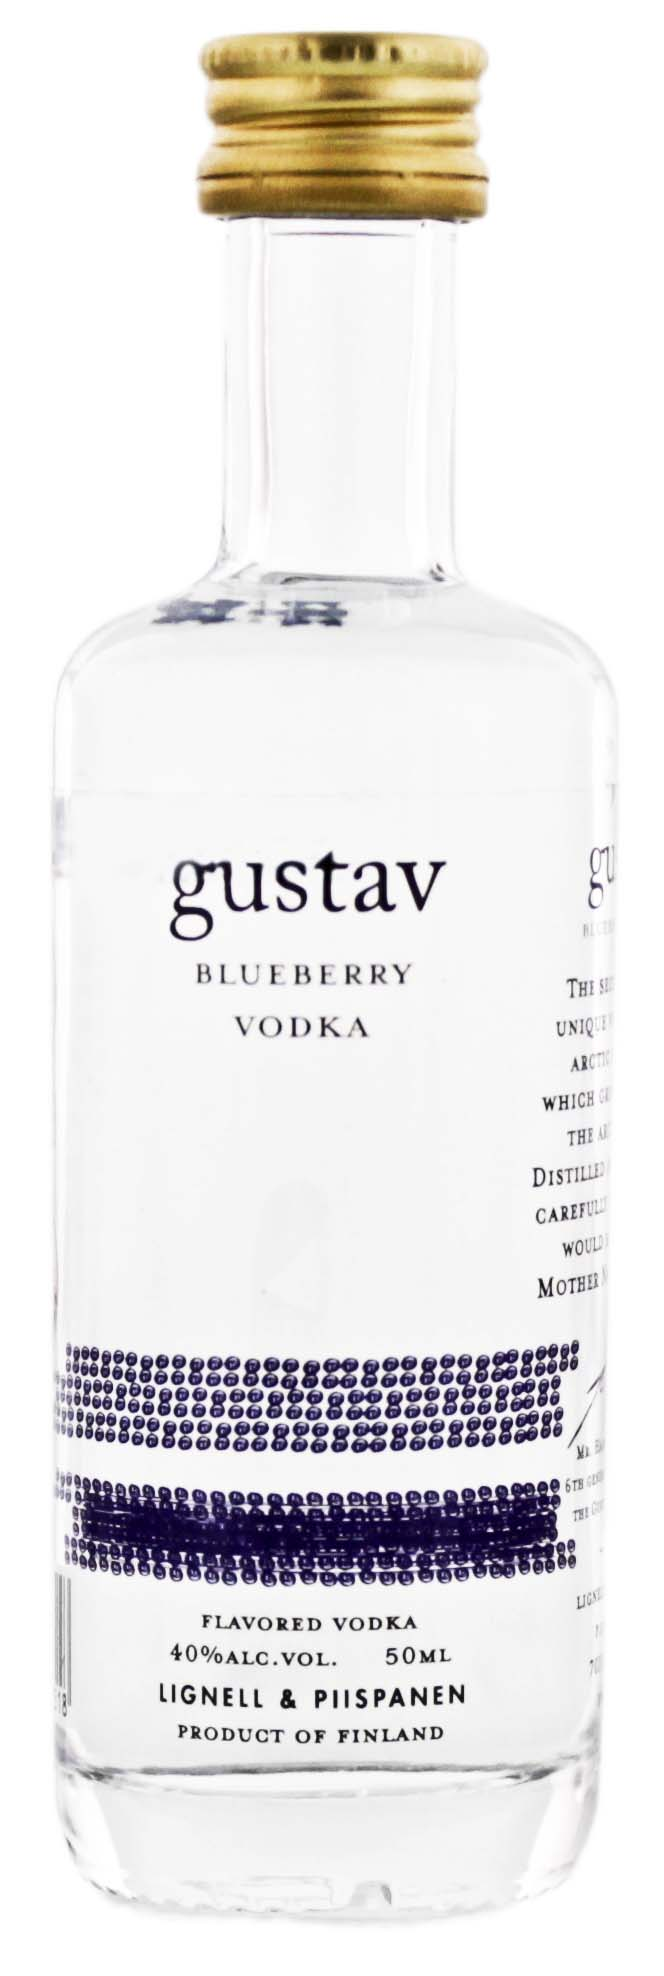 Gustav Blueberry Vodka Miniatures 0,05L